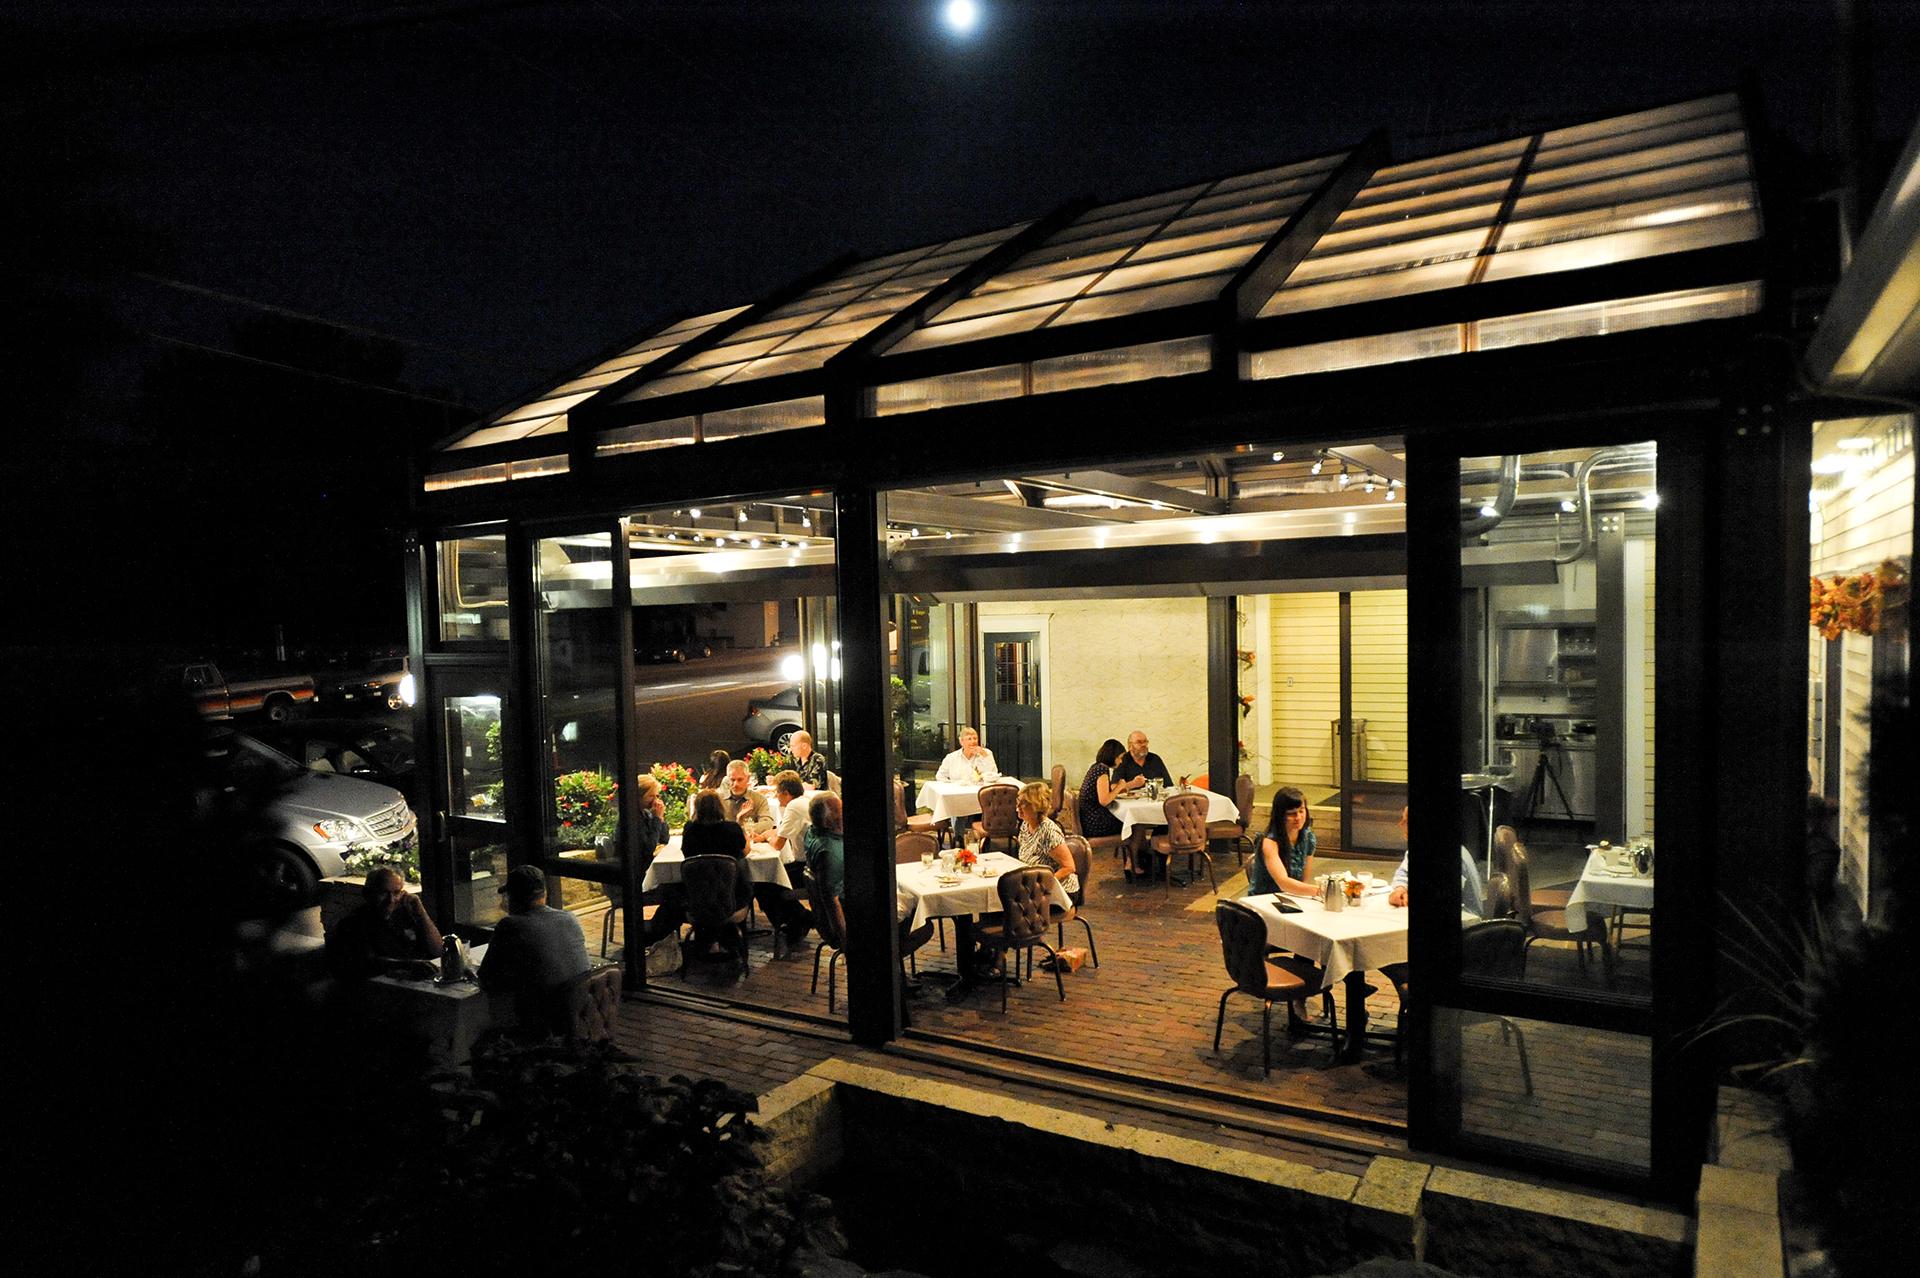 Restaurant patio in the evening